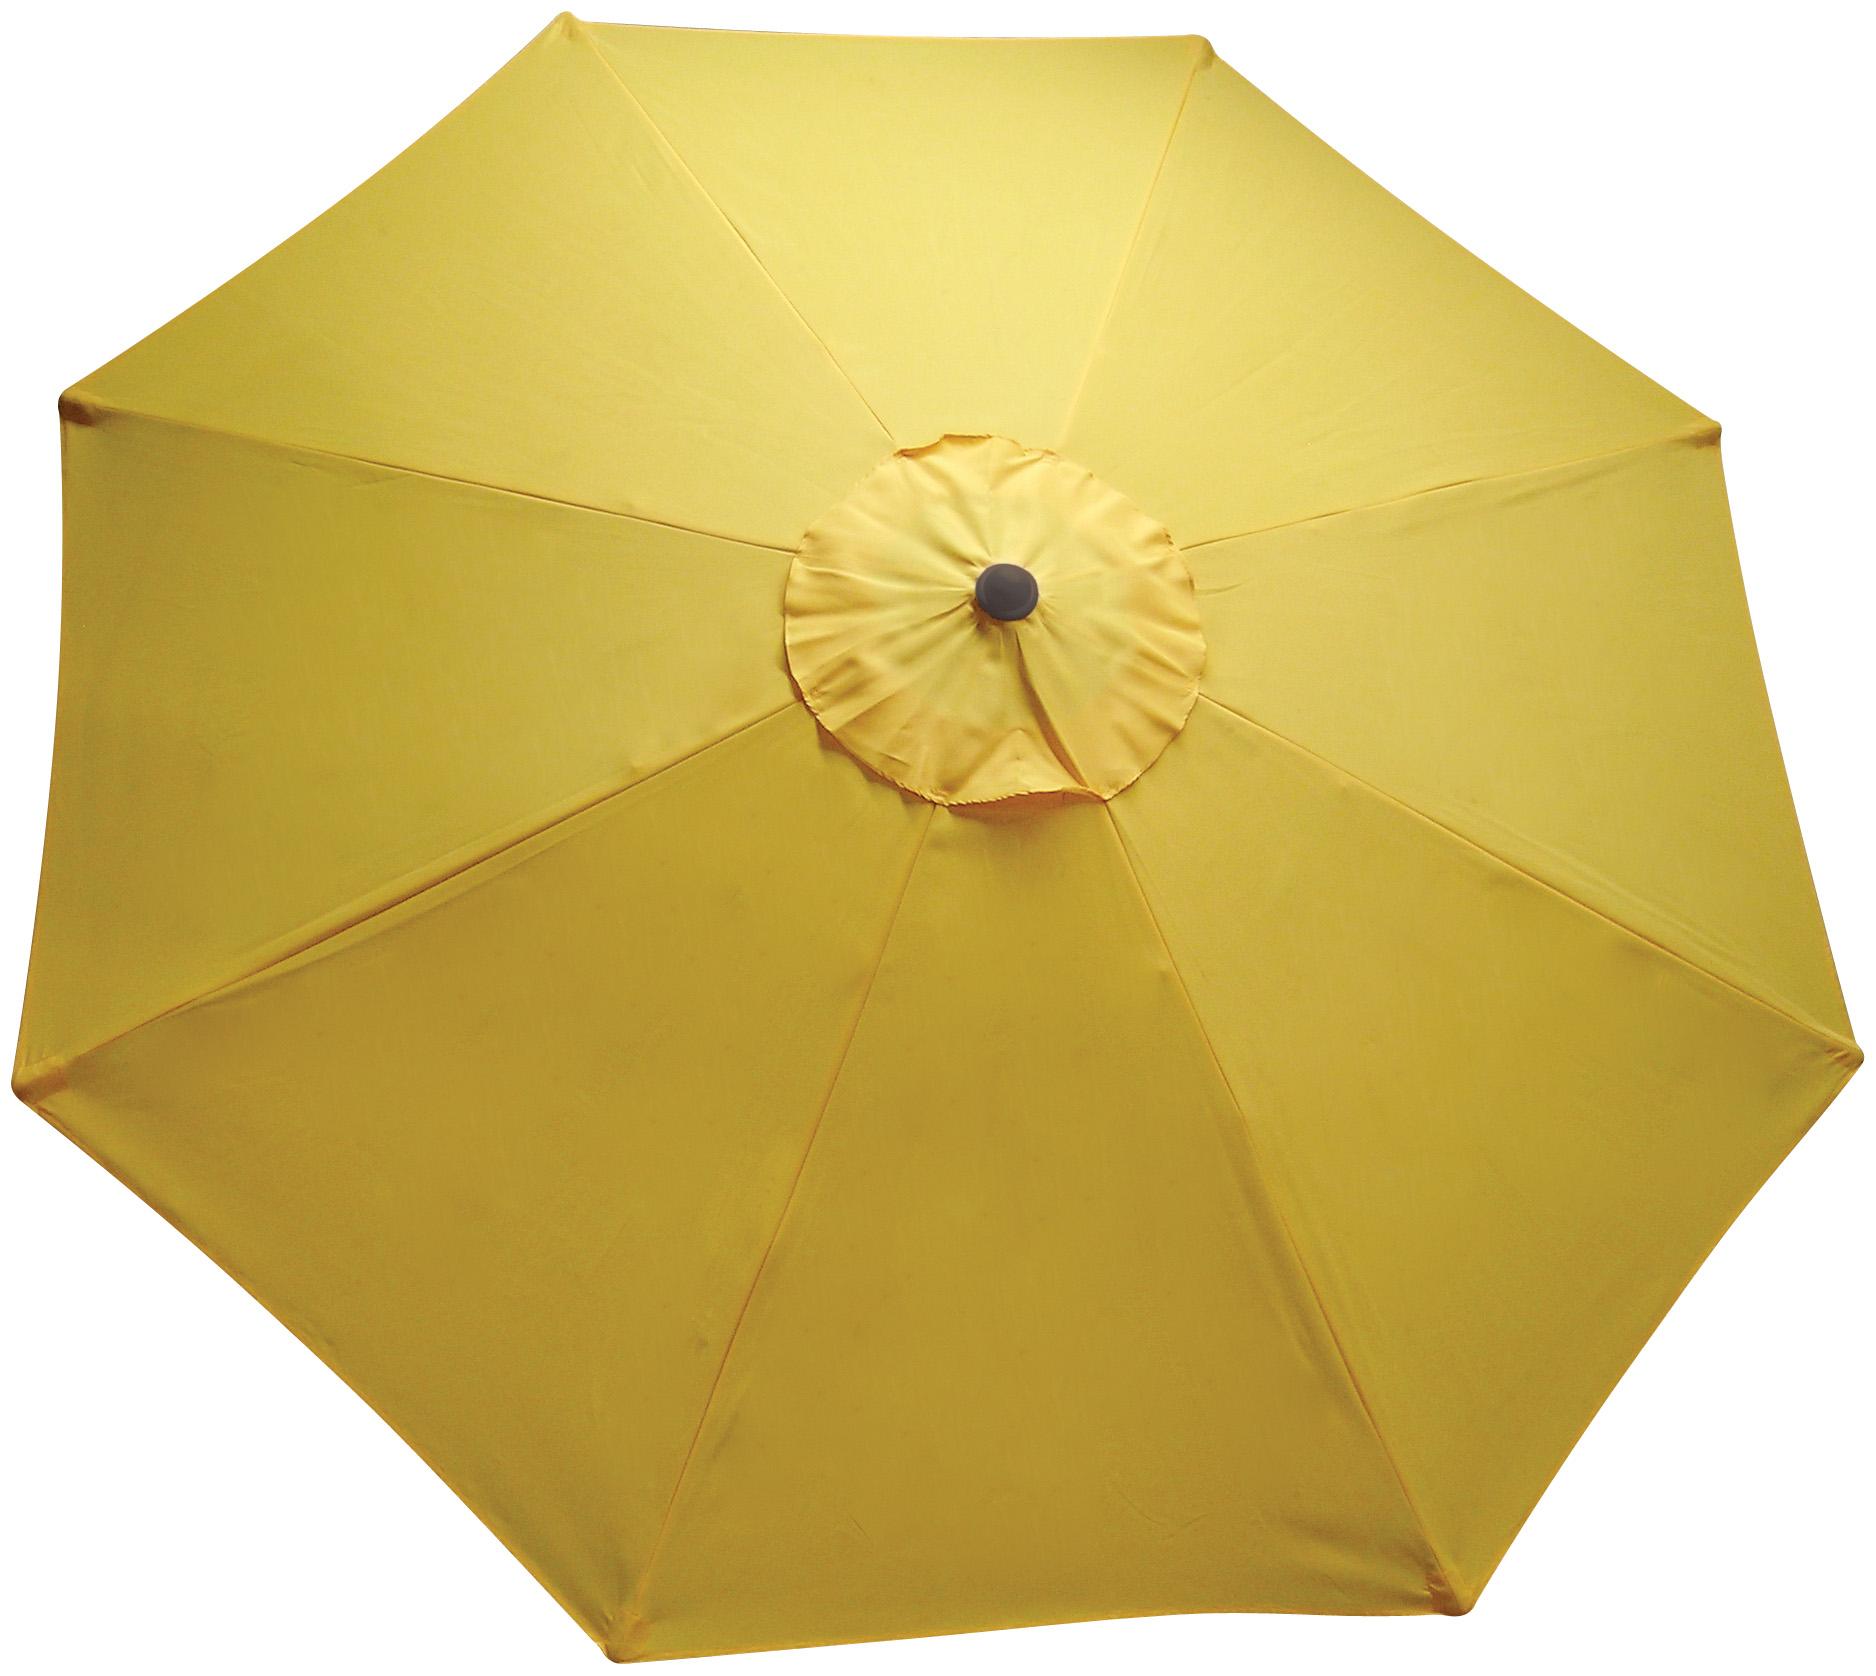 9 Ft Market Umbrella Moka Yellow Pool Supplies Canada